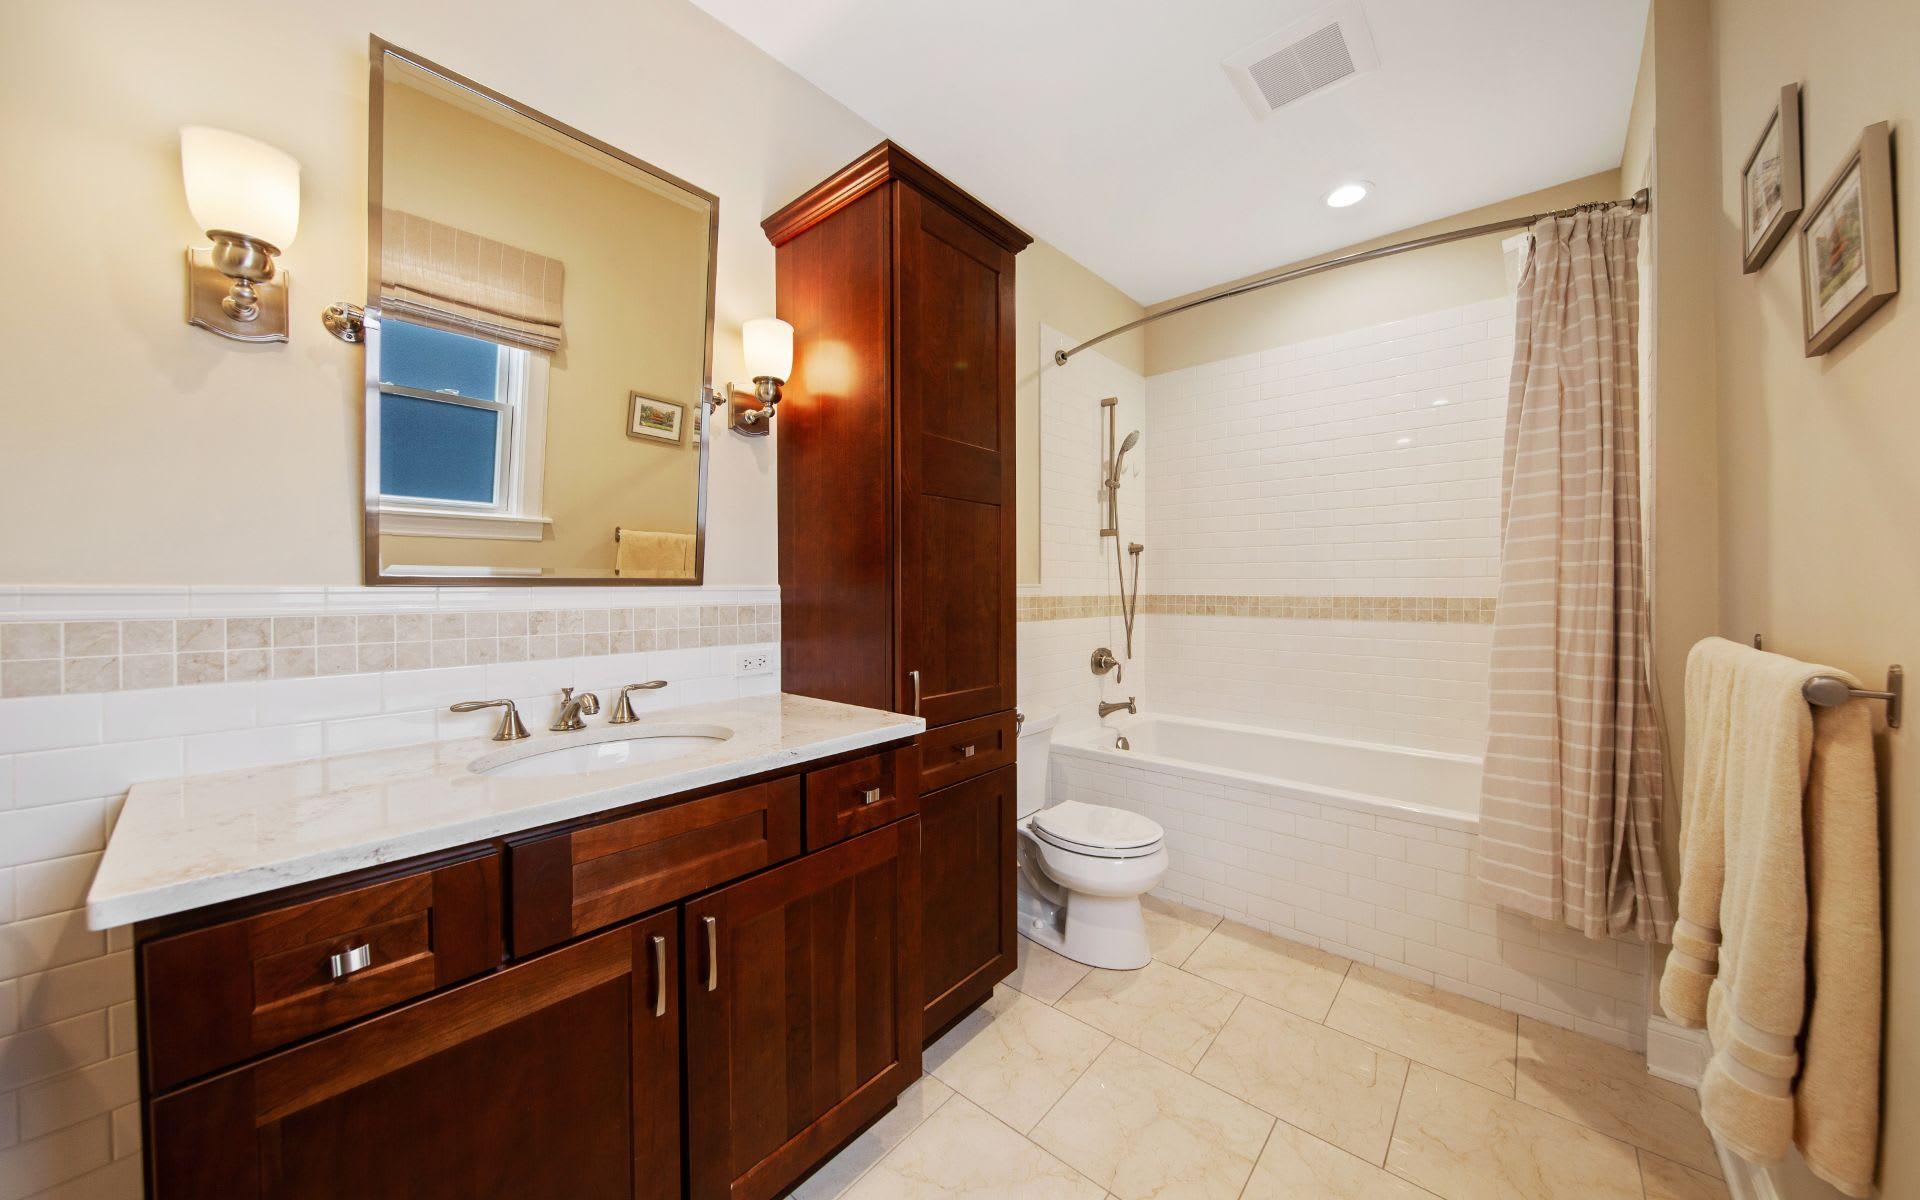 311 S Ridgeland Ave photo